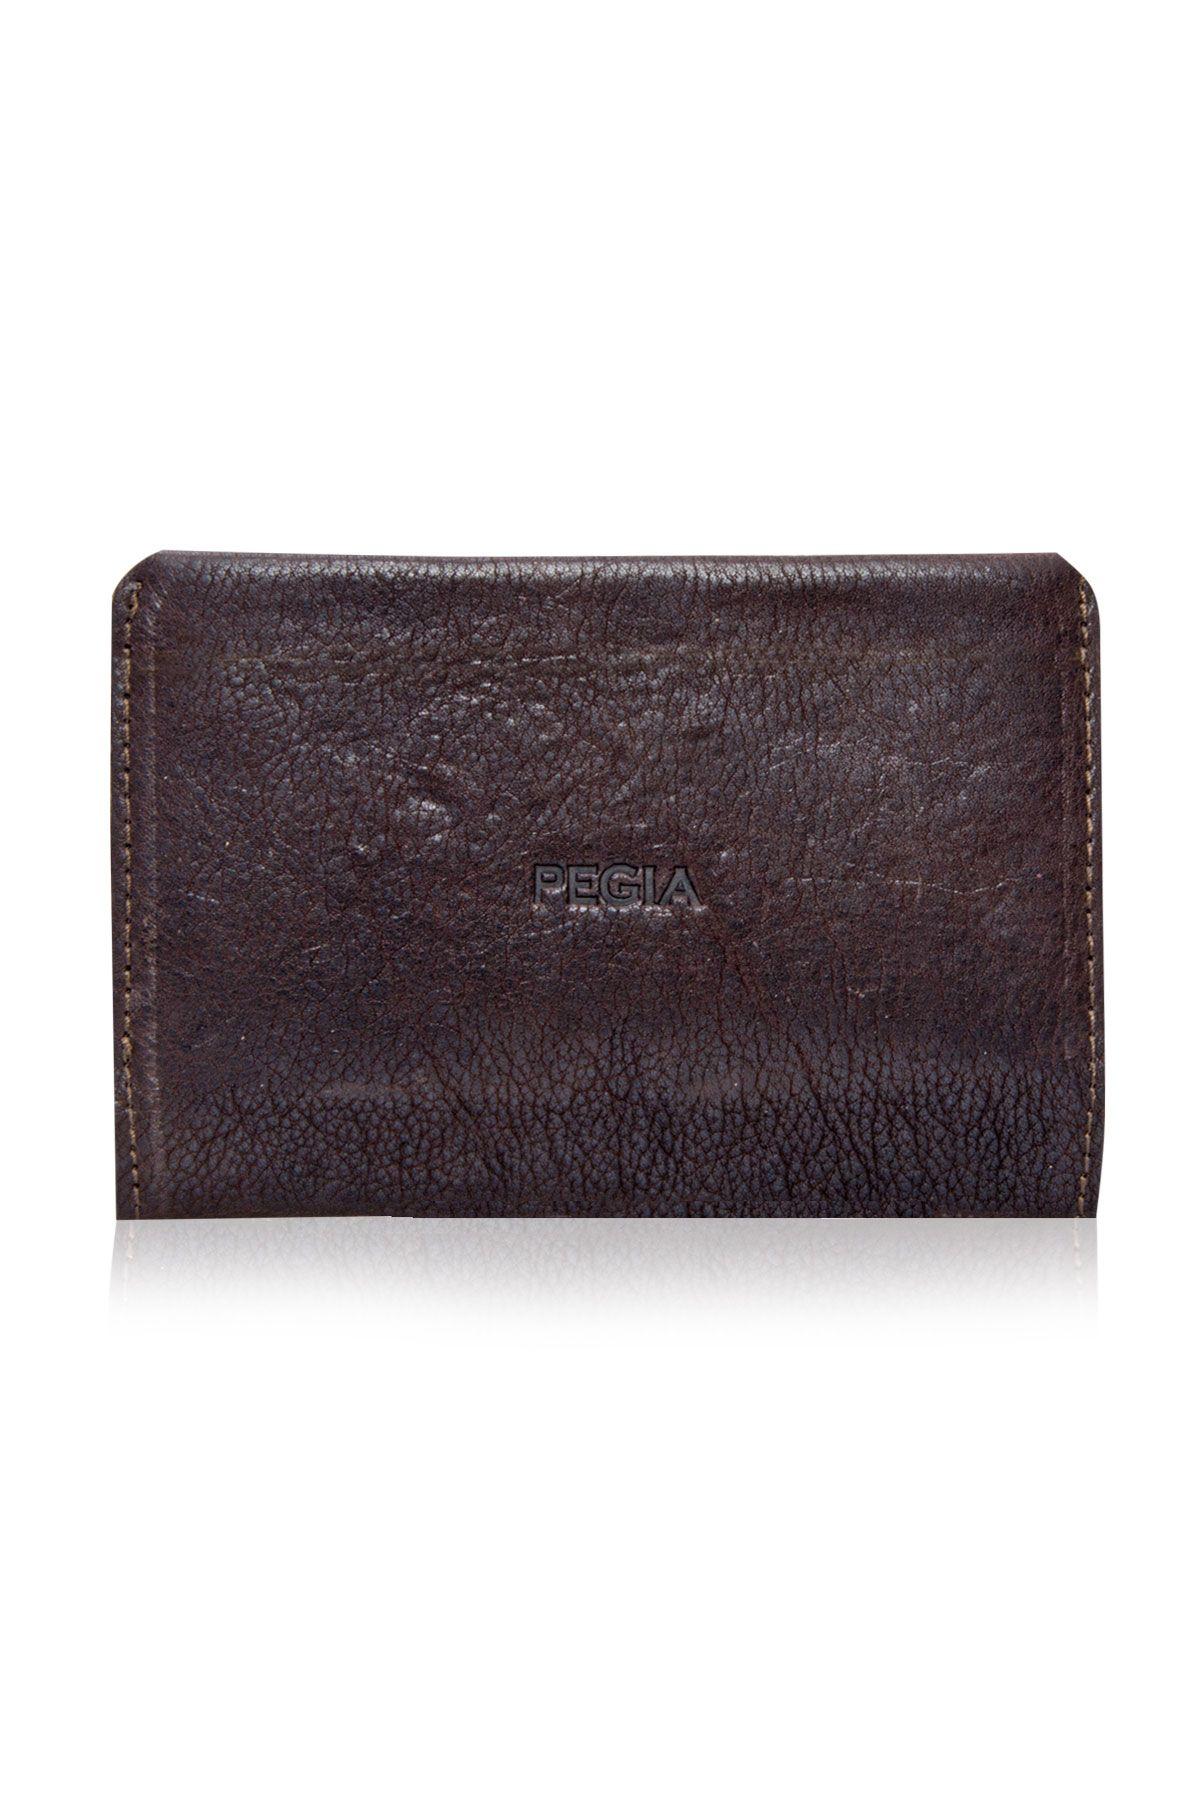 Pegia Genuine Leather Big Size Wallet 19CZ300 Brown